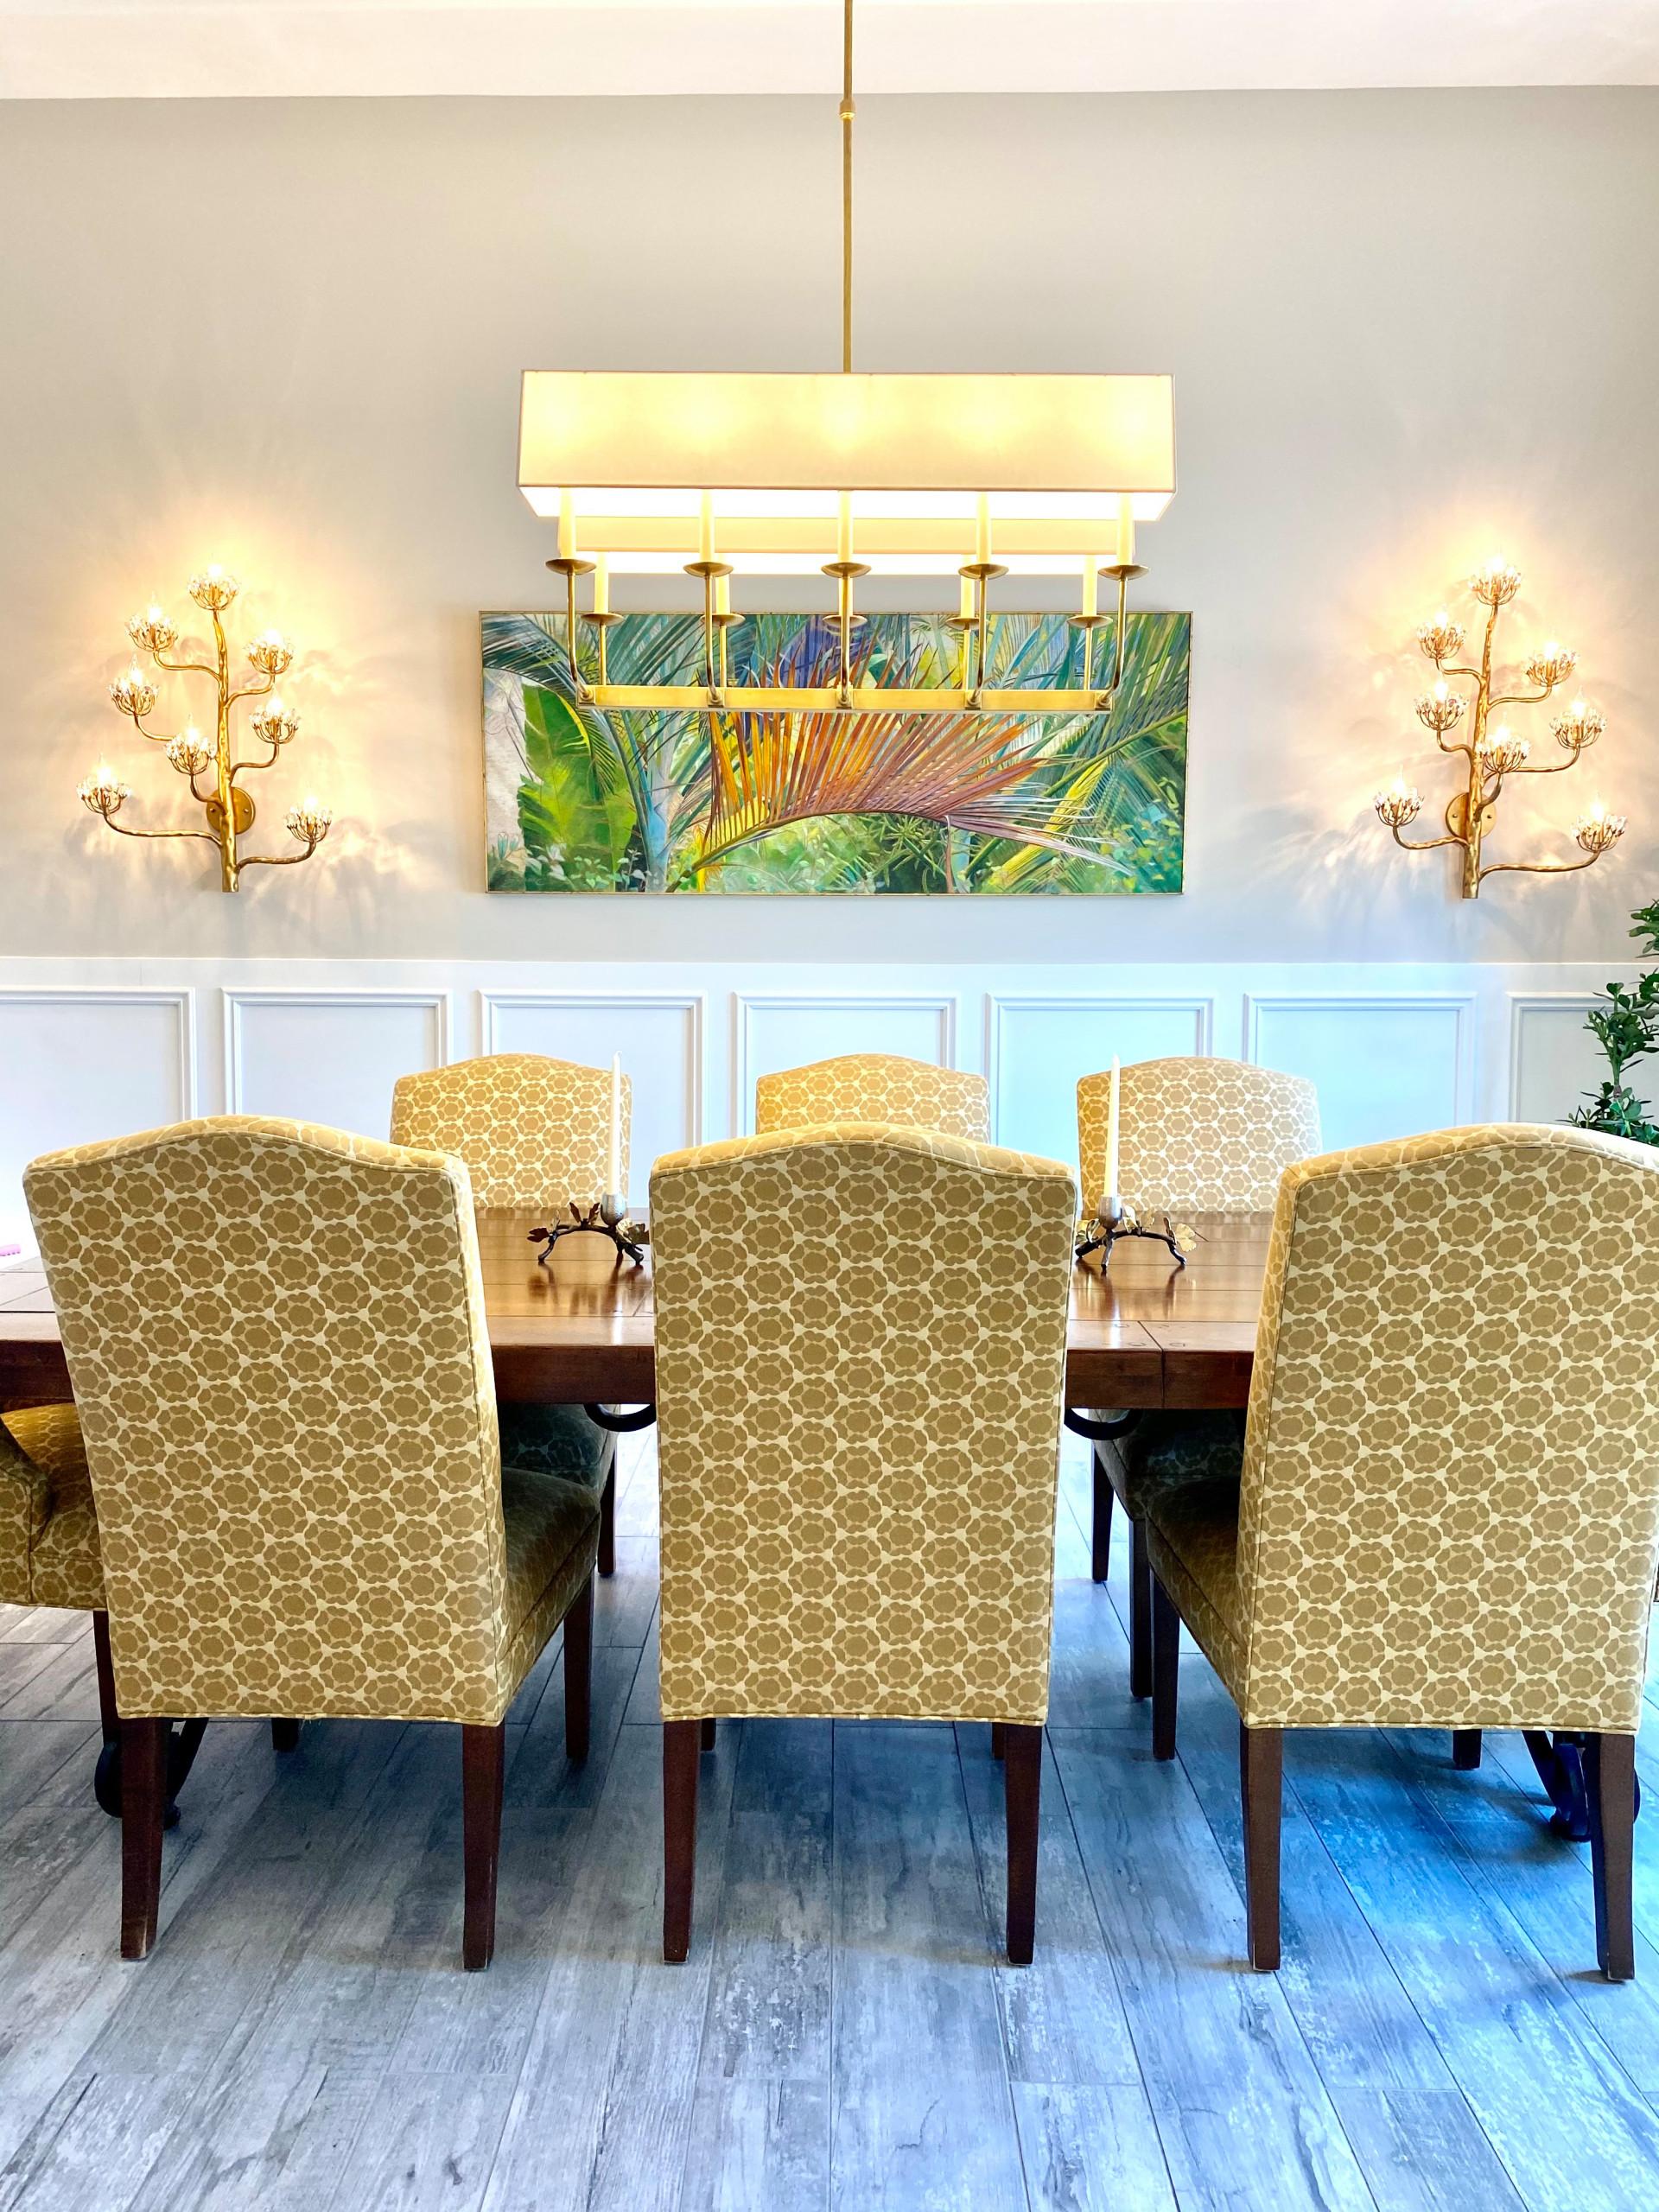 Home design - transitional home design idea in Phoenix